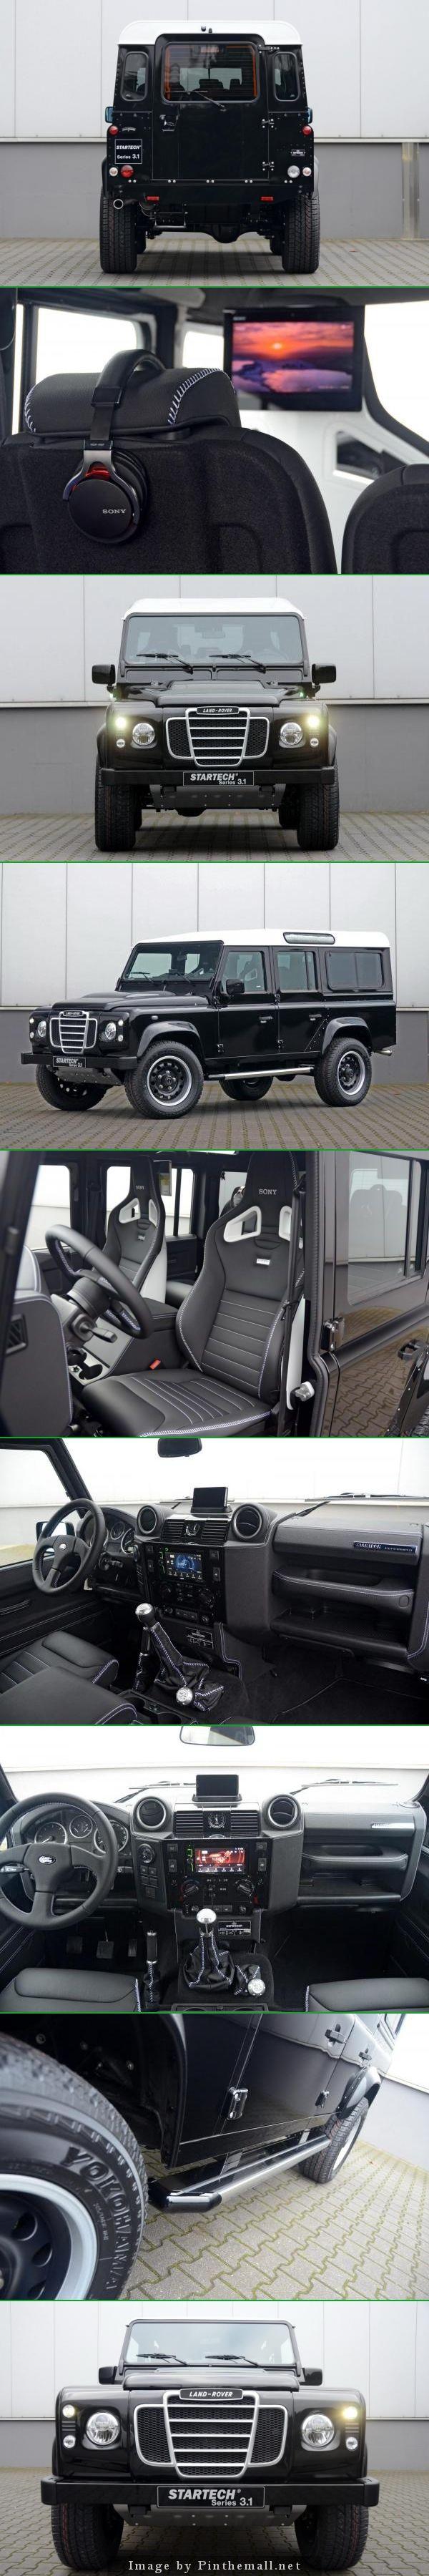 Land Rover Defender Startech 3.1 Series - created via http://pinthemall.net